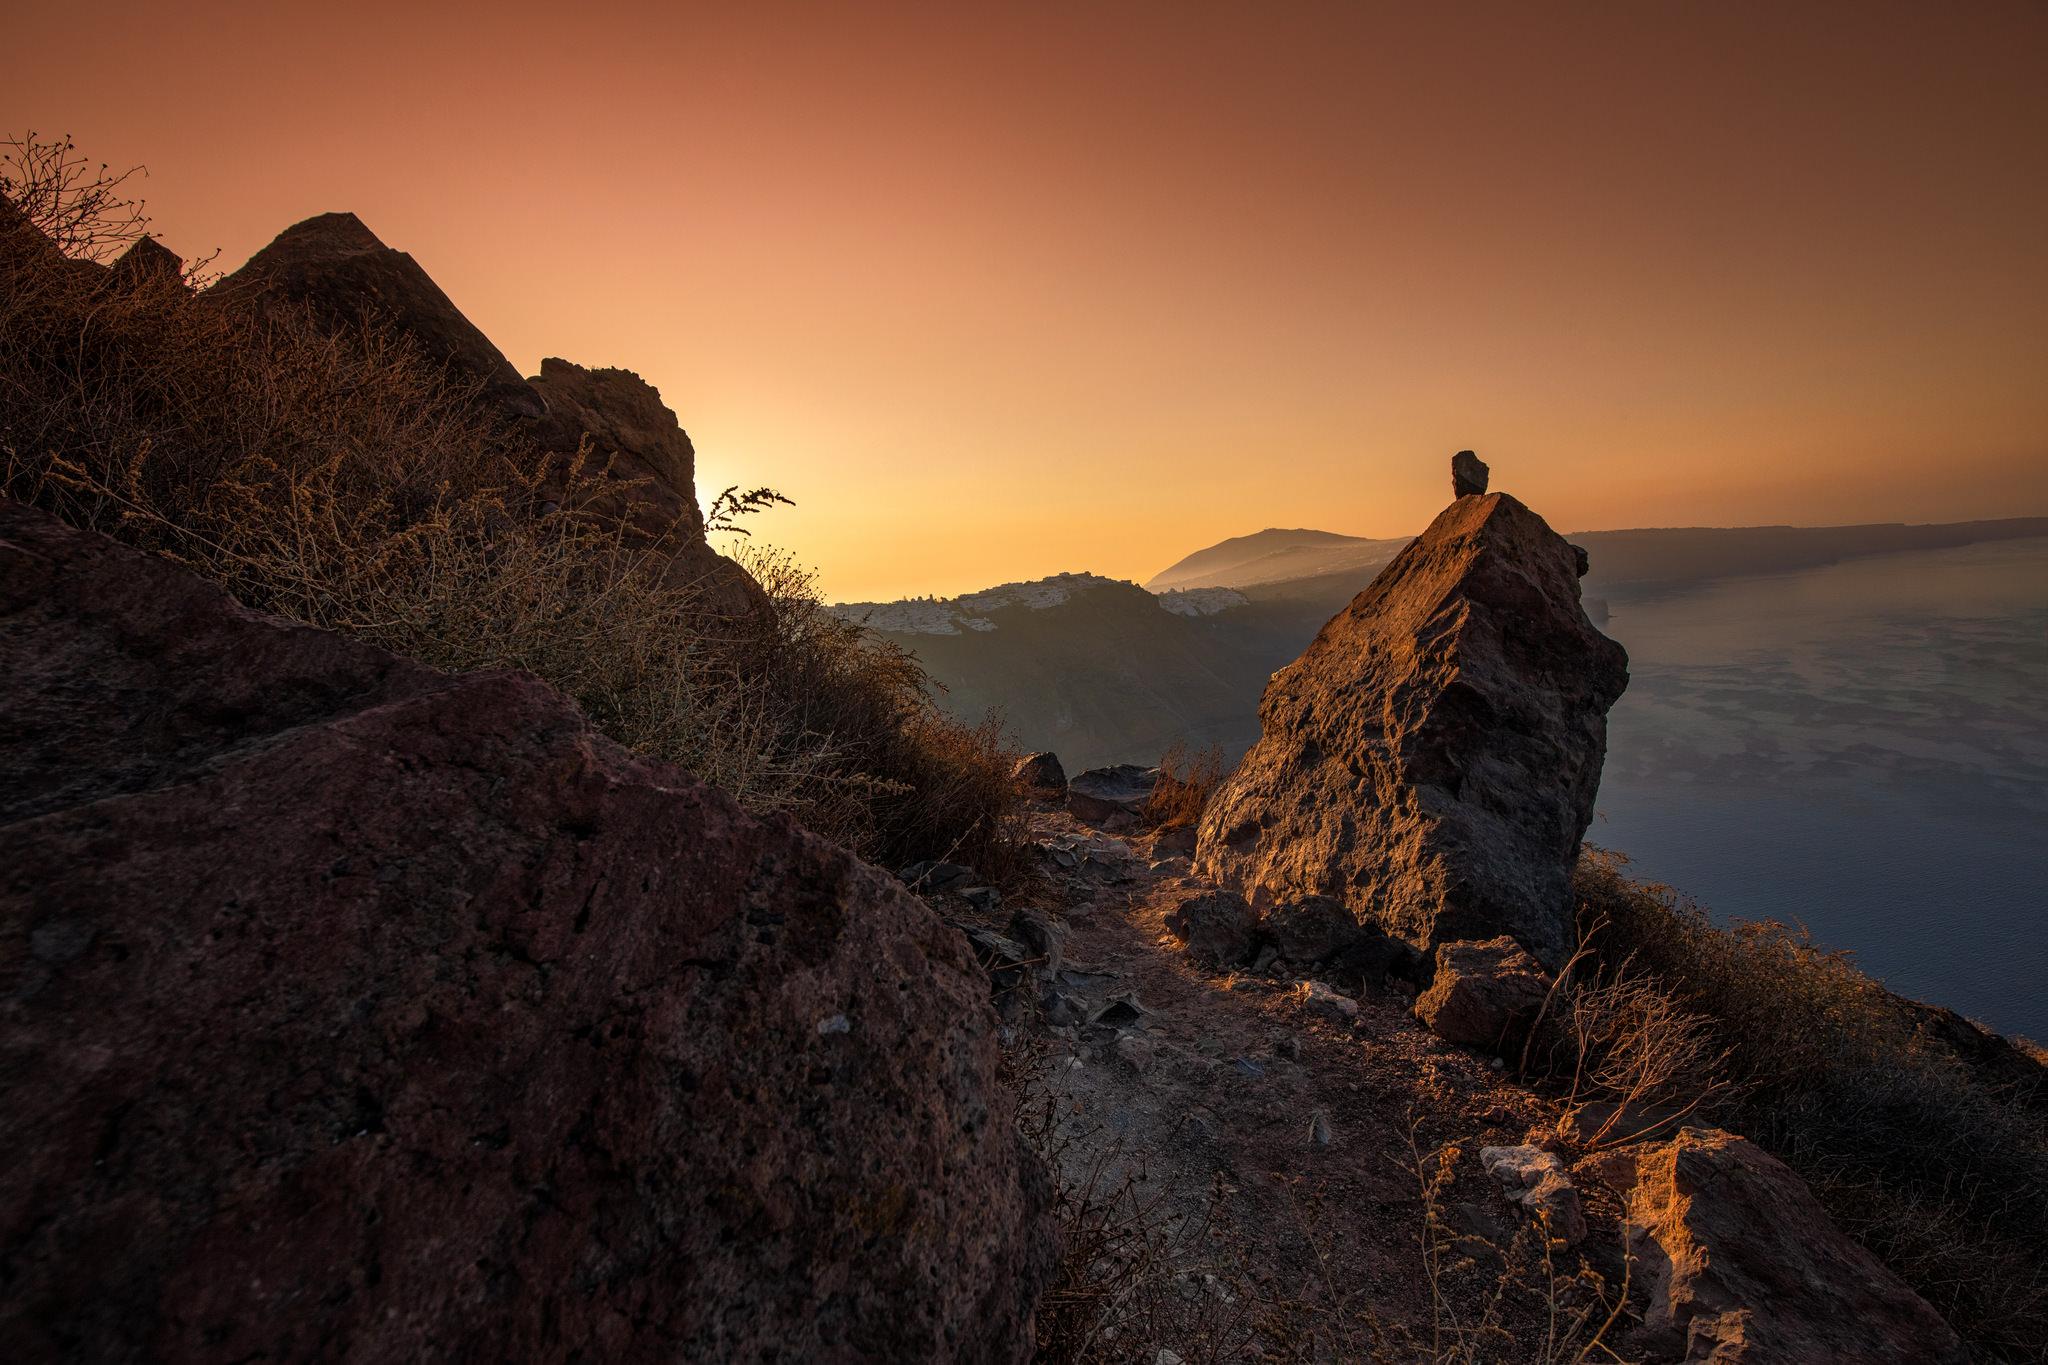 Landschaftsfotografie fotograf filmemacher frankfurt patrick schmetzer drohne landschaft natur 38